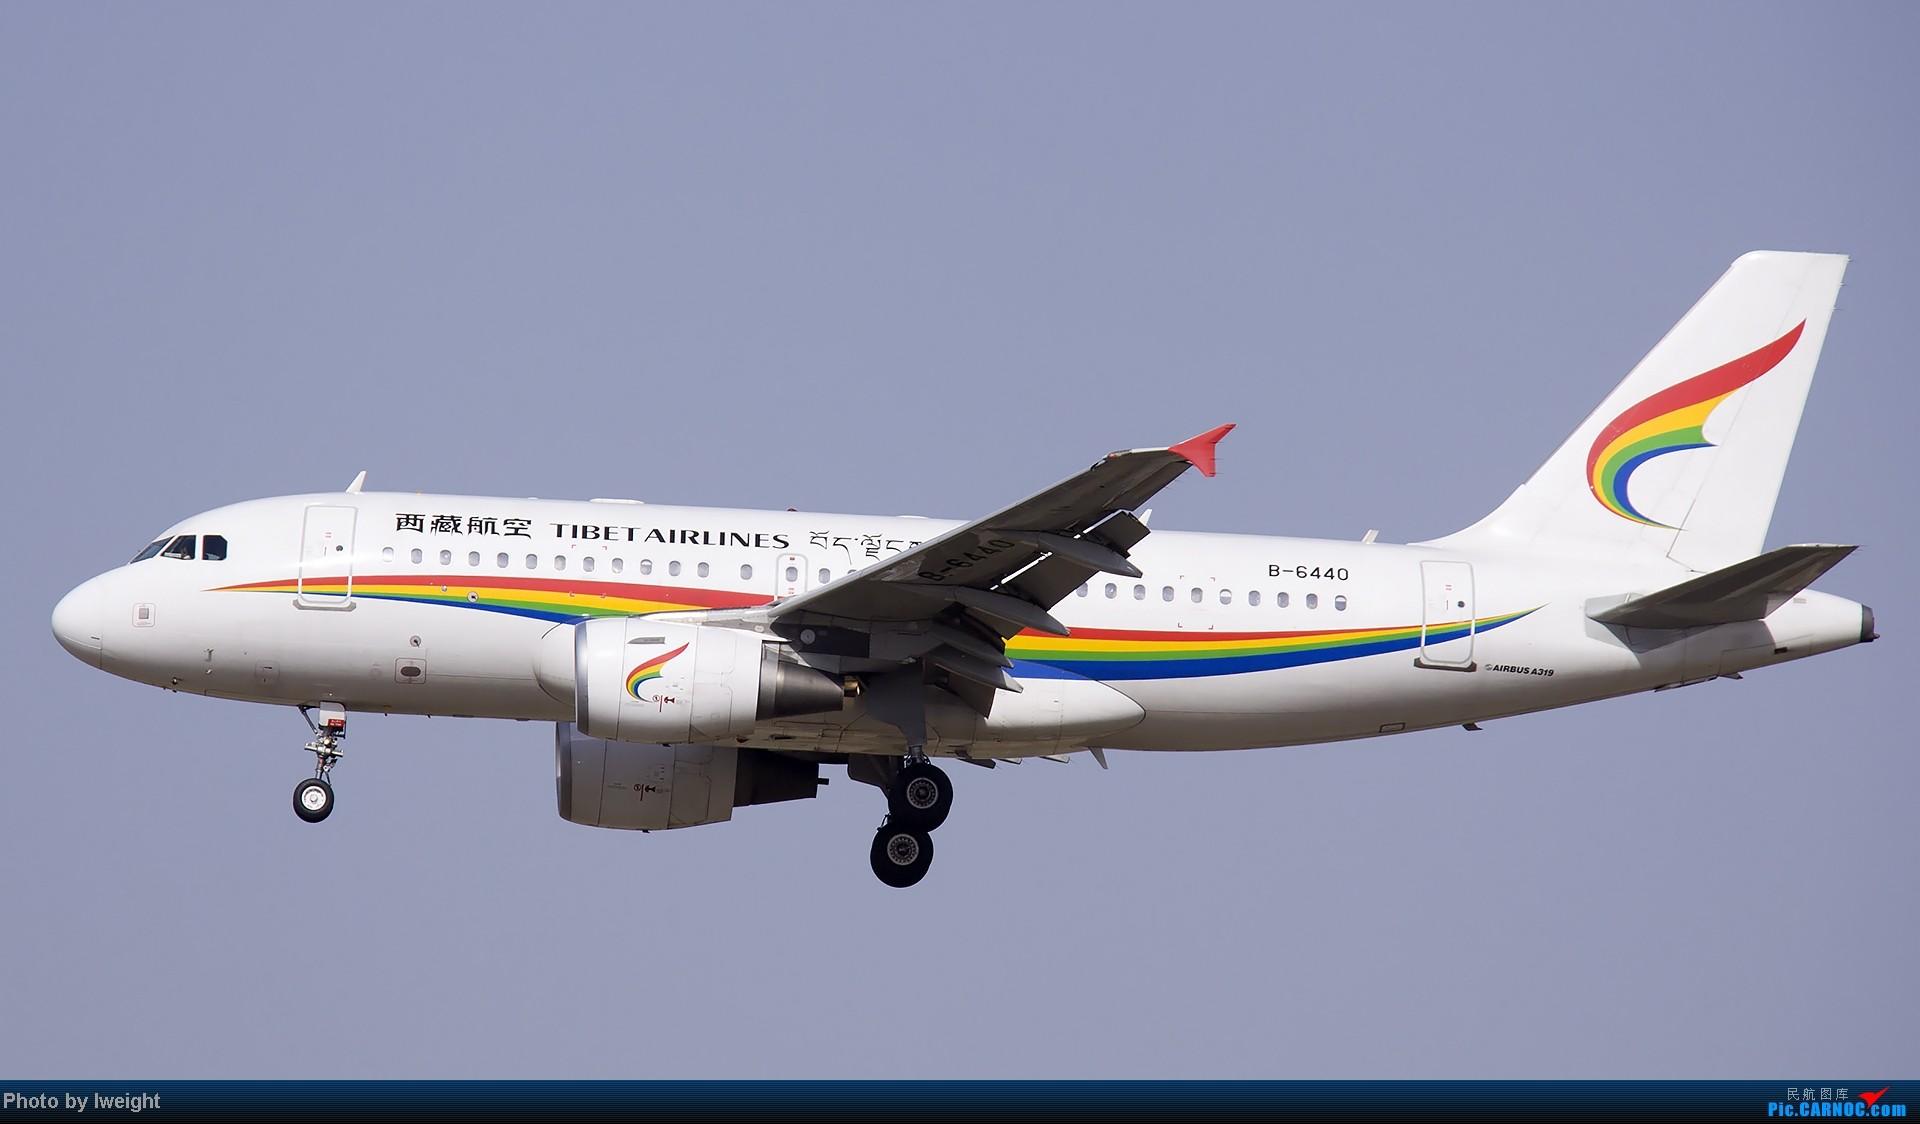 Re:[原创]5月3日首都机场风云变幻的下午 AIRBUS A319-100 B-6440 中国北京首都机场